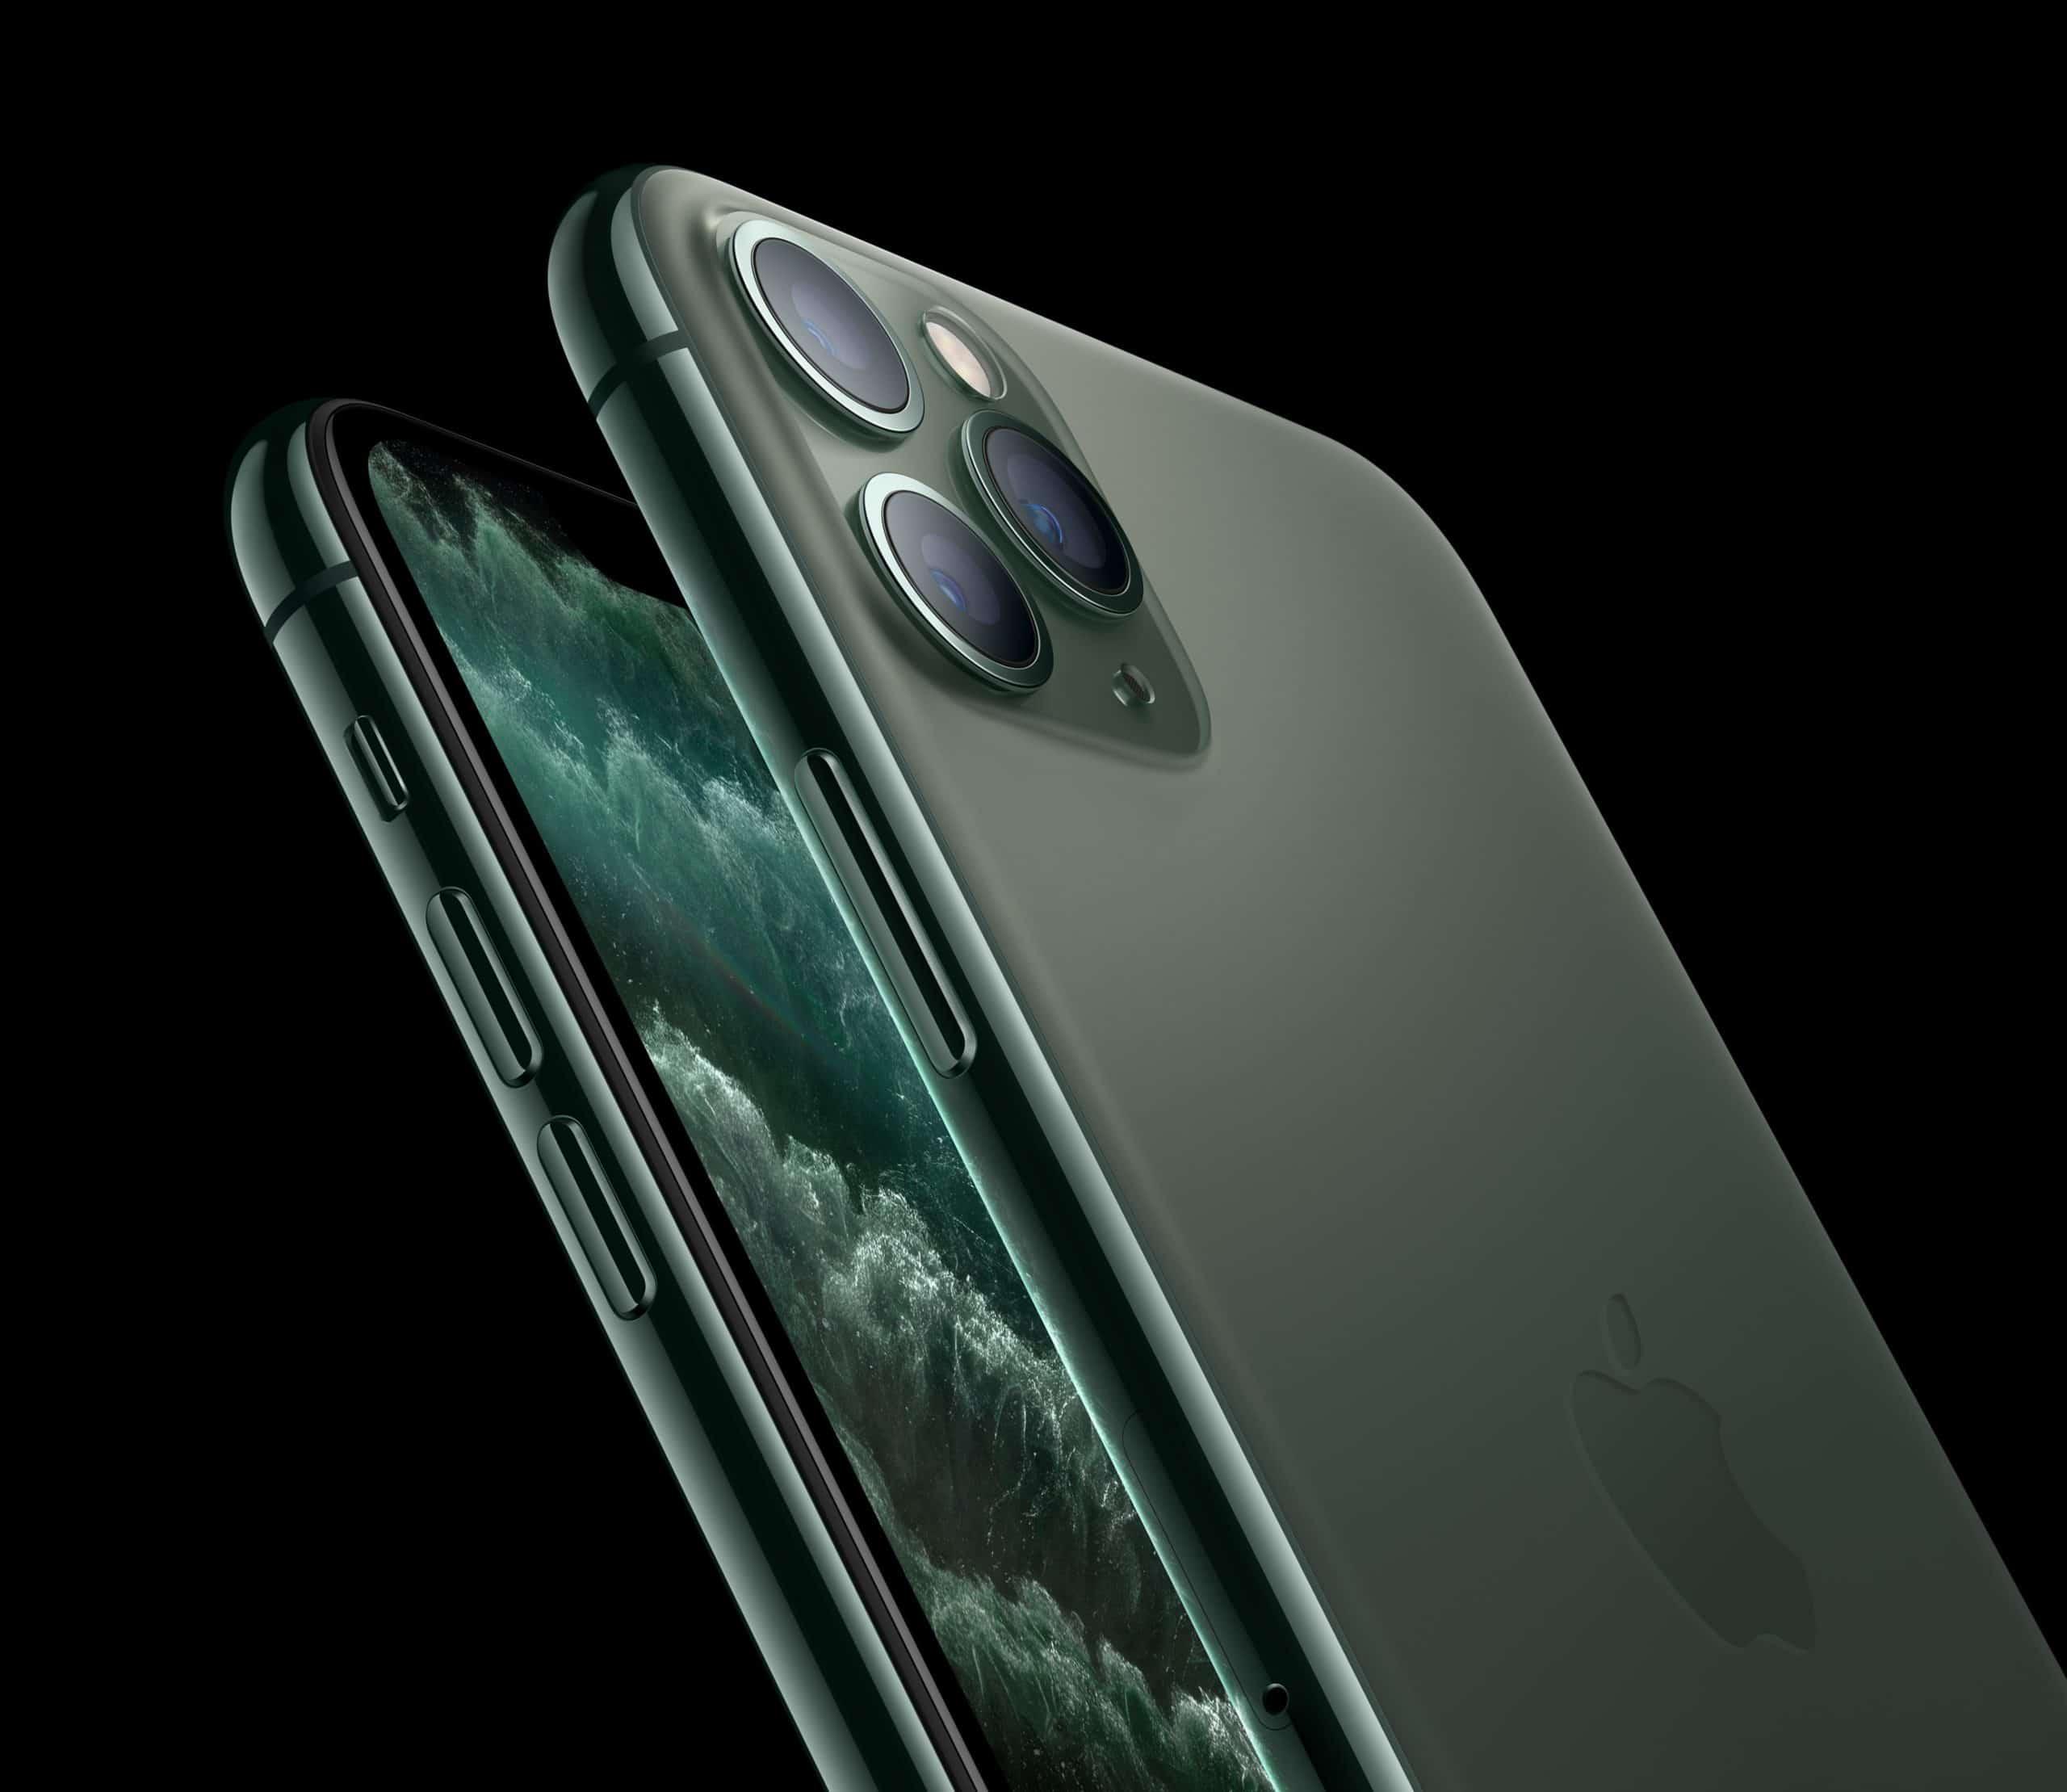 iPhone 11 Pro Max na cor verde meia-noite inclinado na diagonal